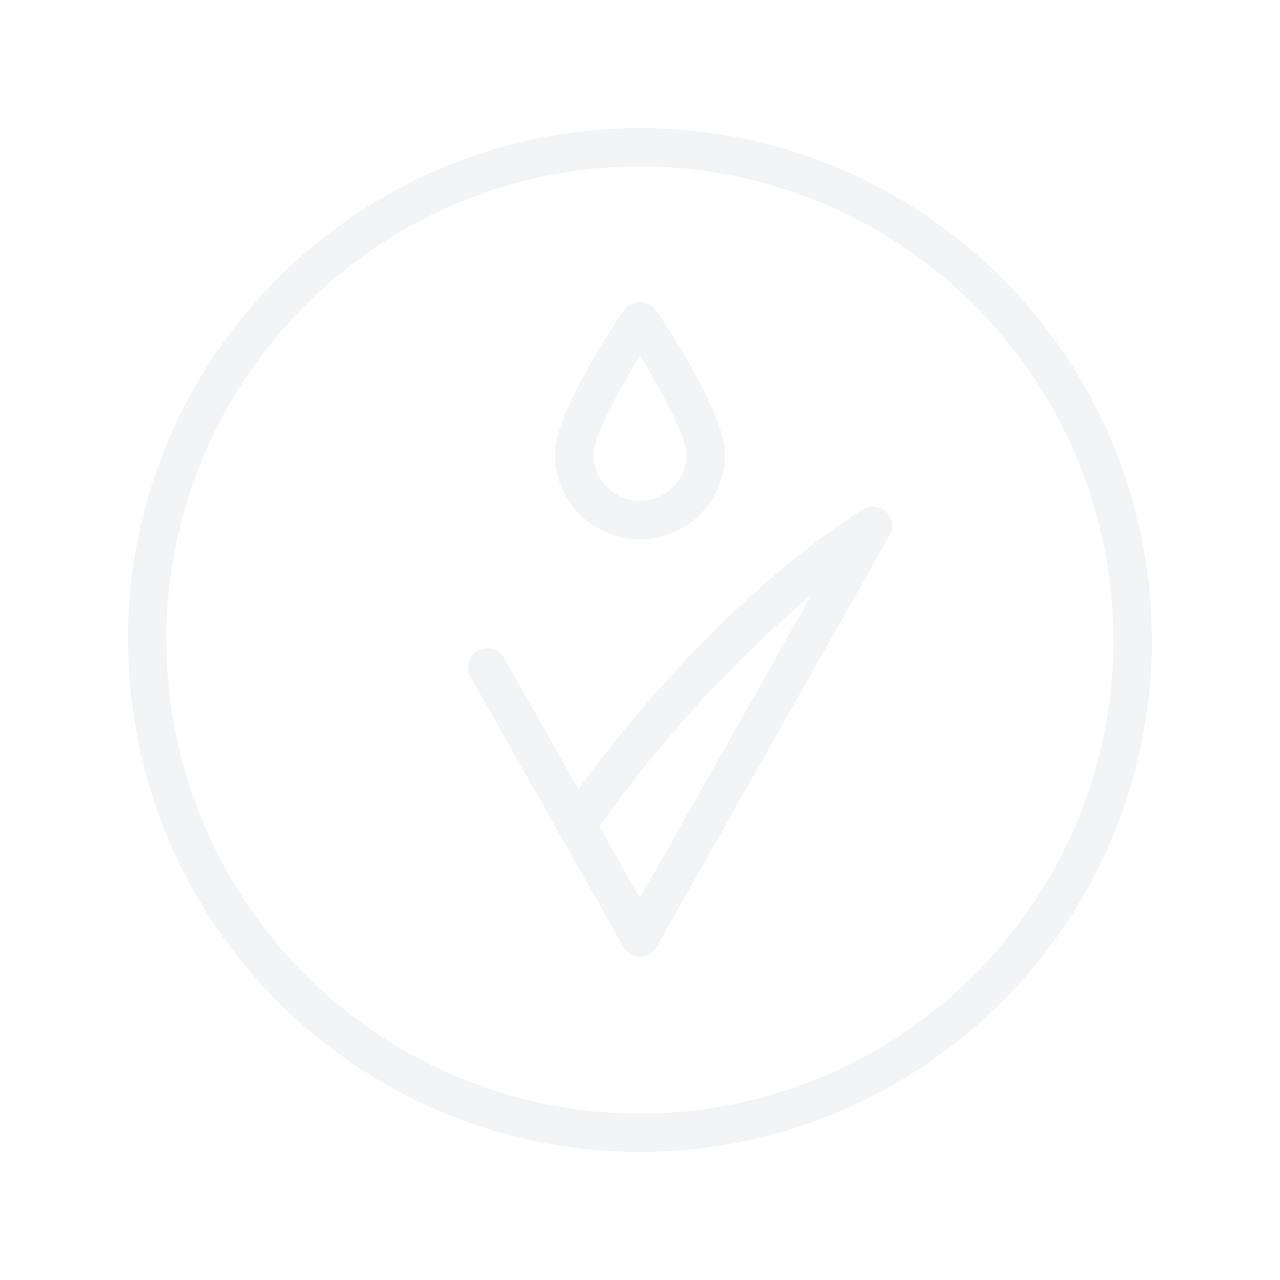 BIOKAP Nutricolor 10.0 Golden Extra Light Blond Permanent Hair Dye 140ml